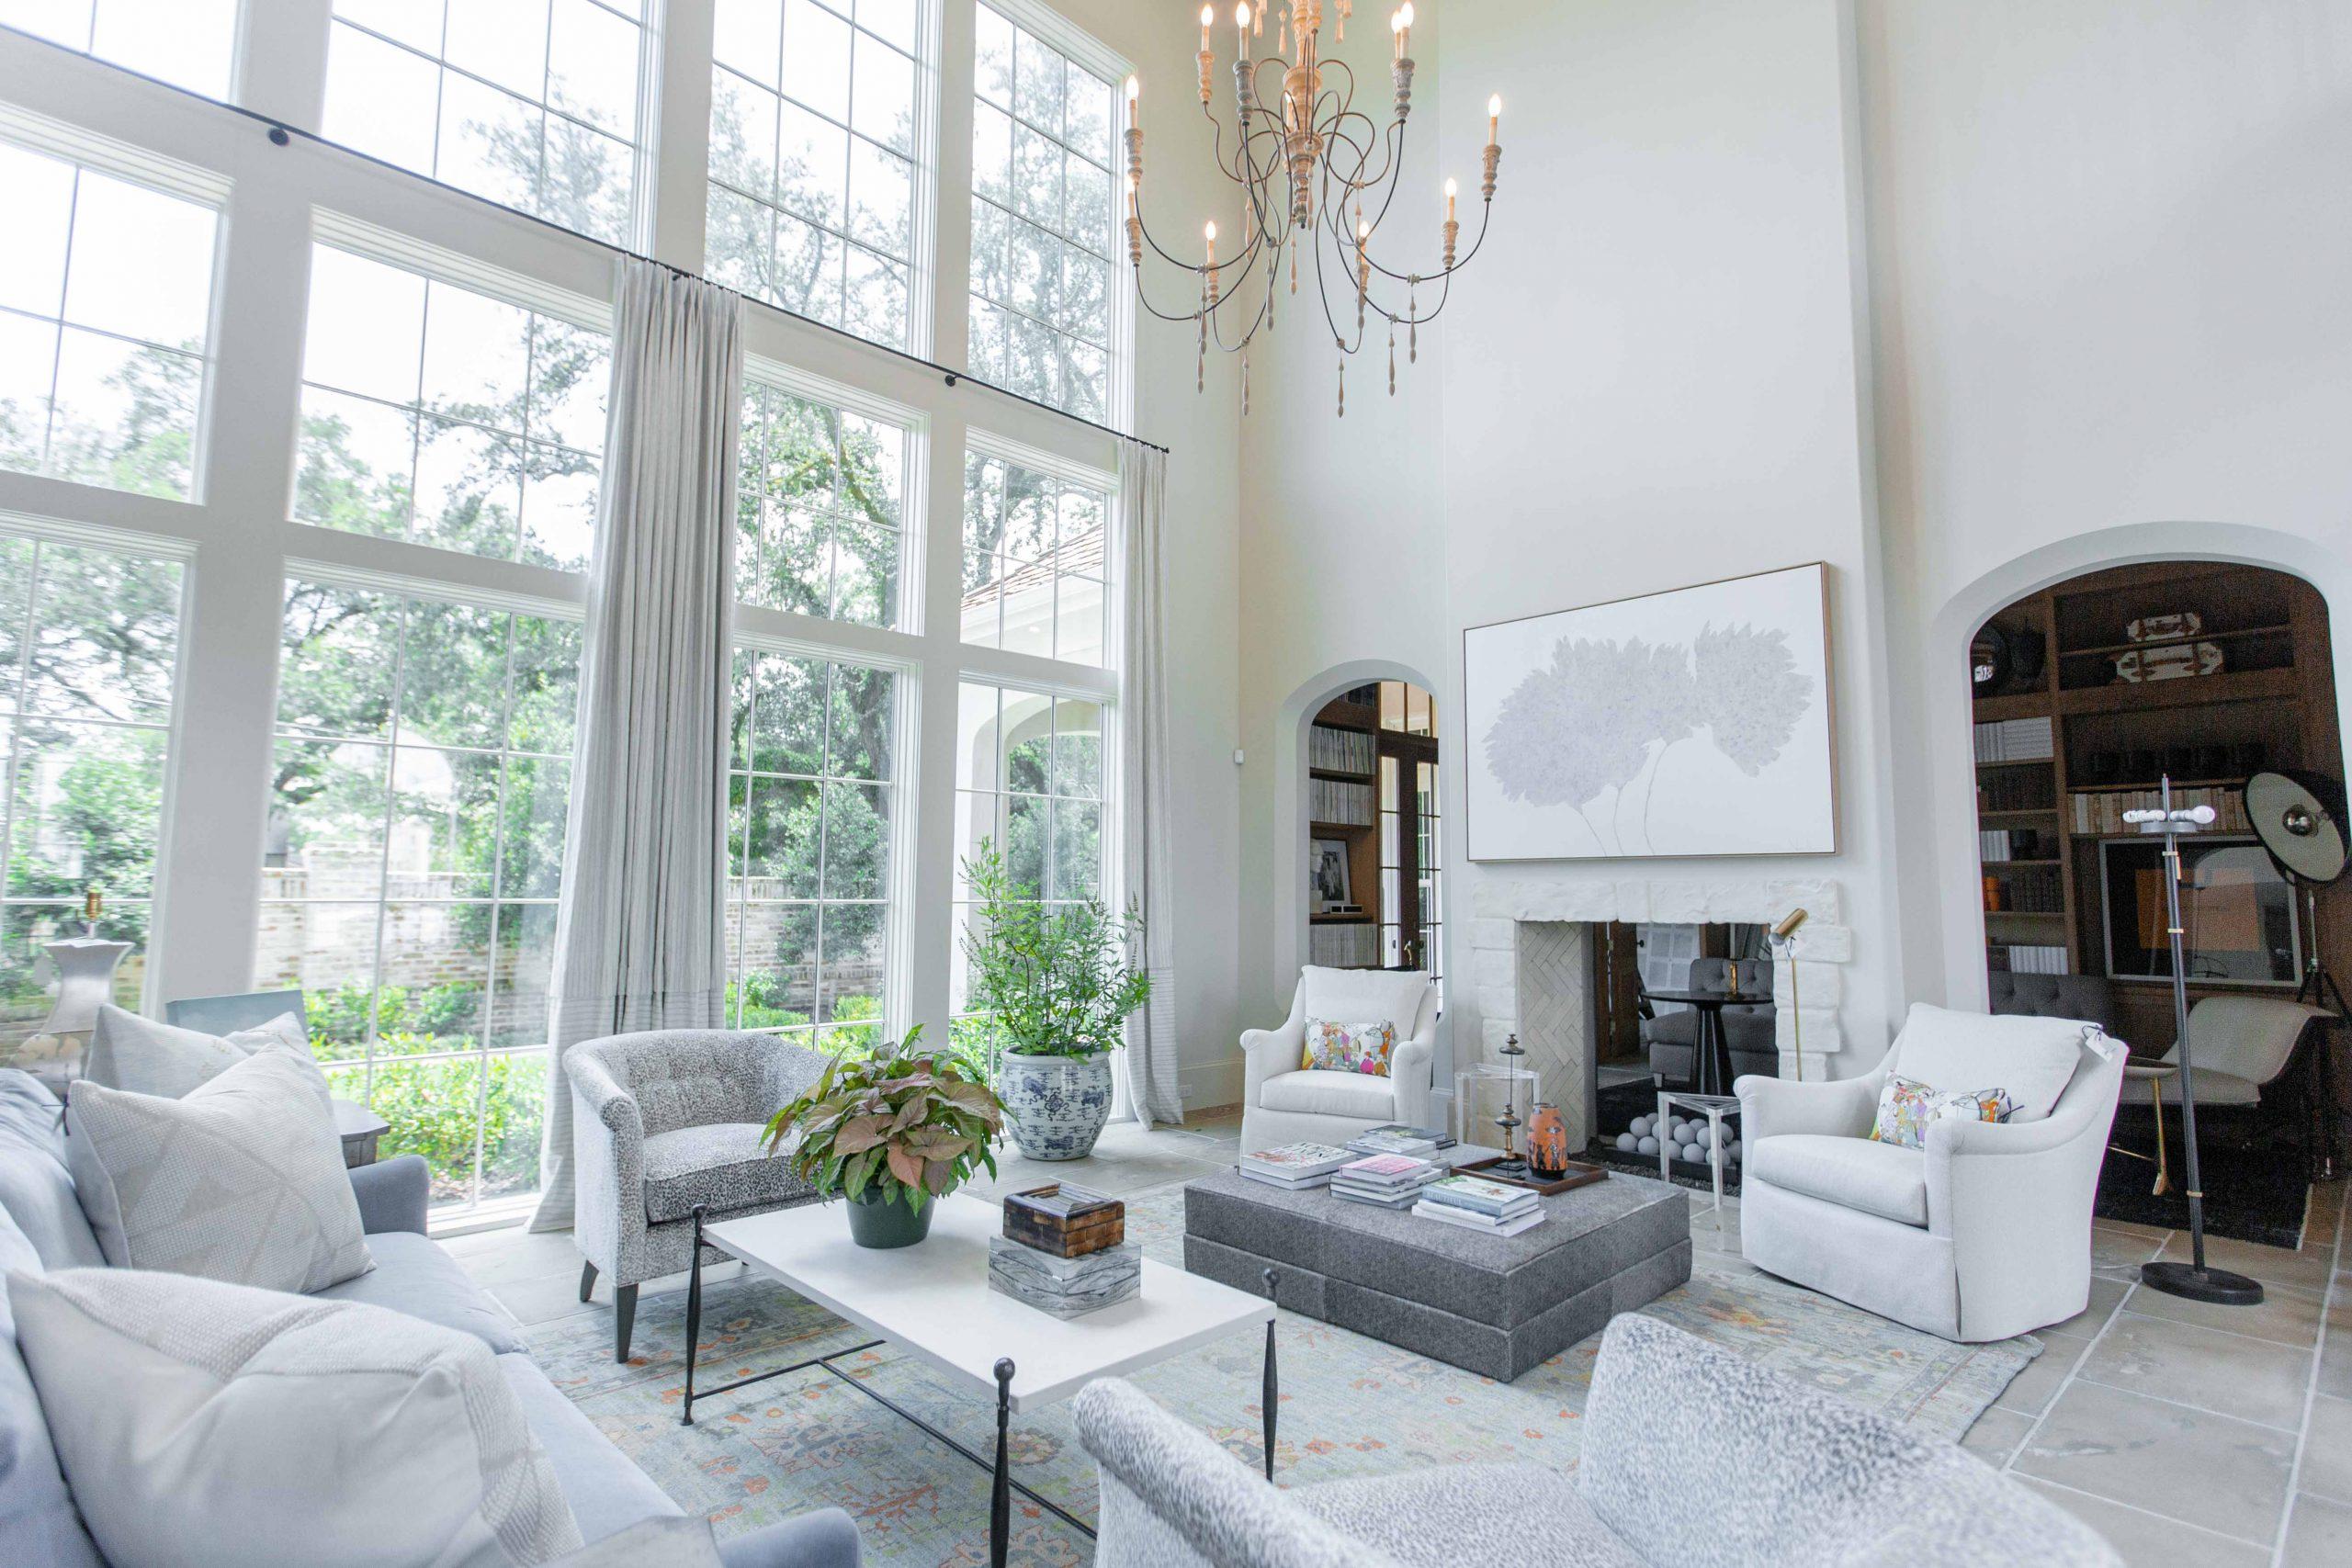 dixon-smith-interiors-baton-rouge-interior-design-custom-ivy-house-show-home-Web-0002